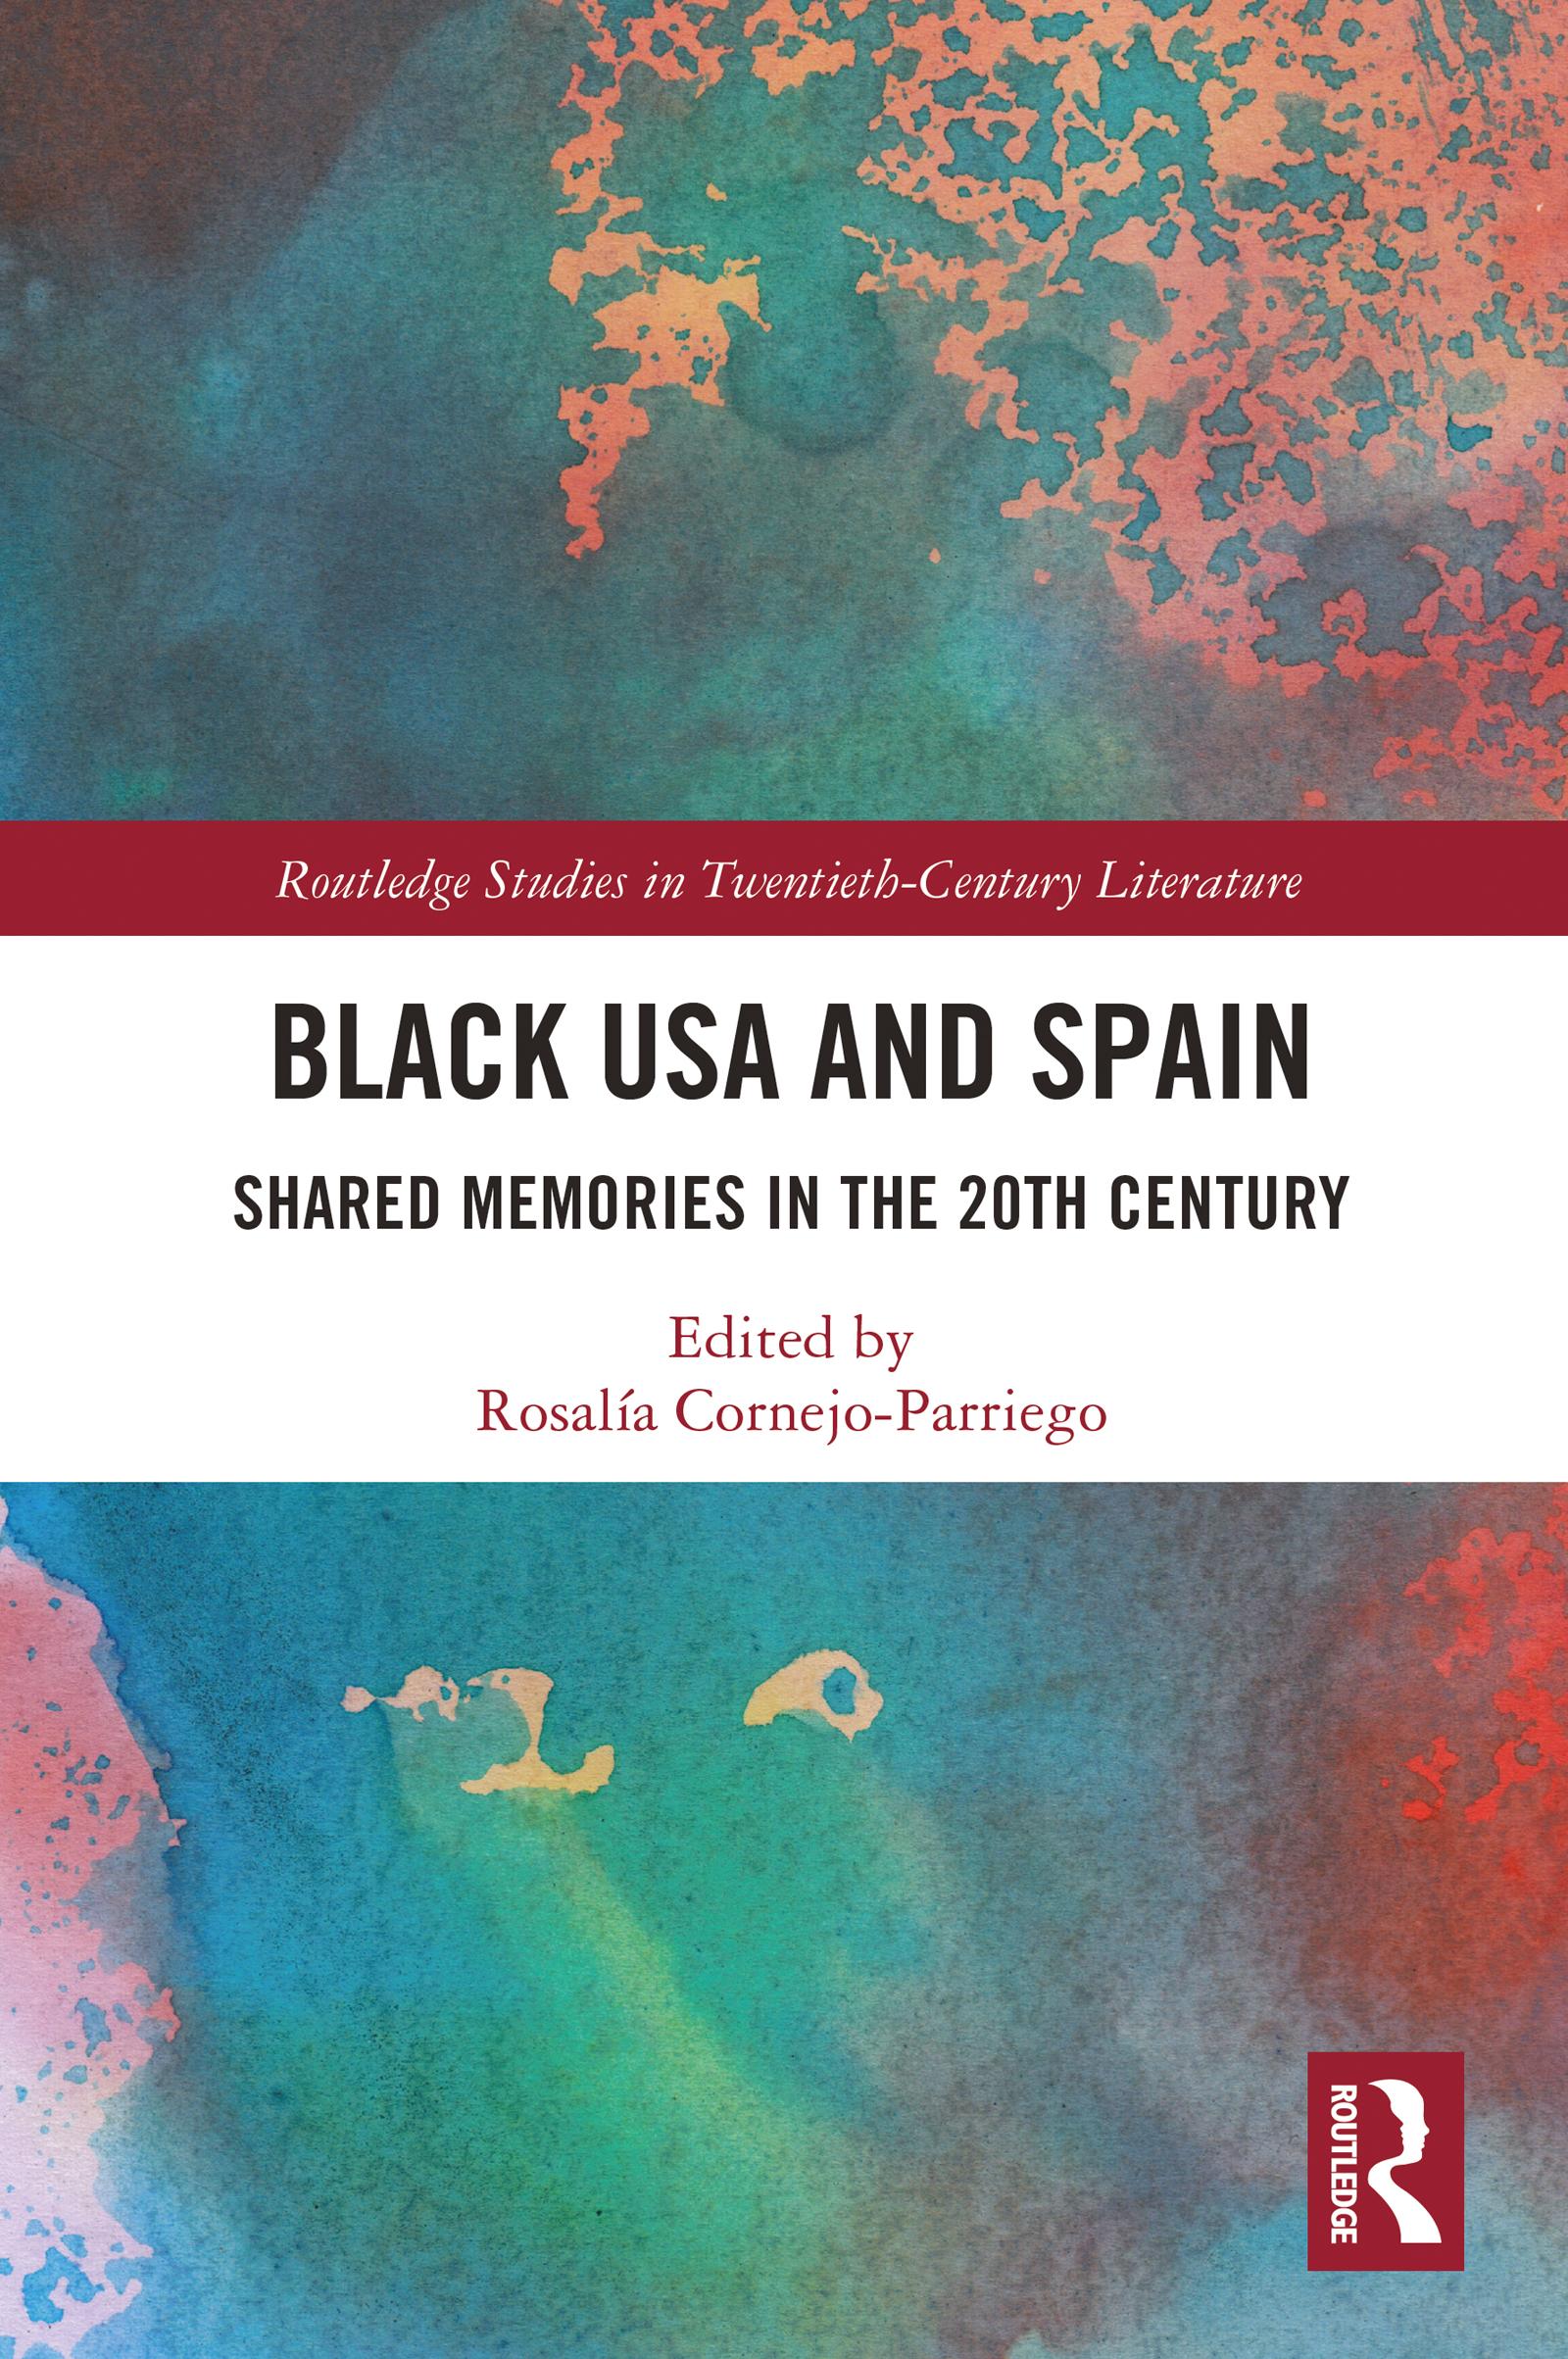 Black USA and Spain